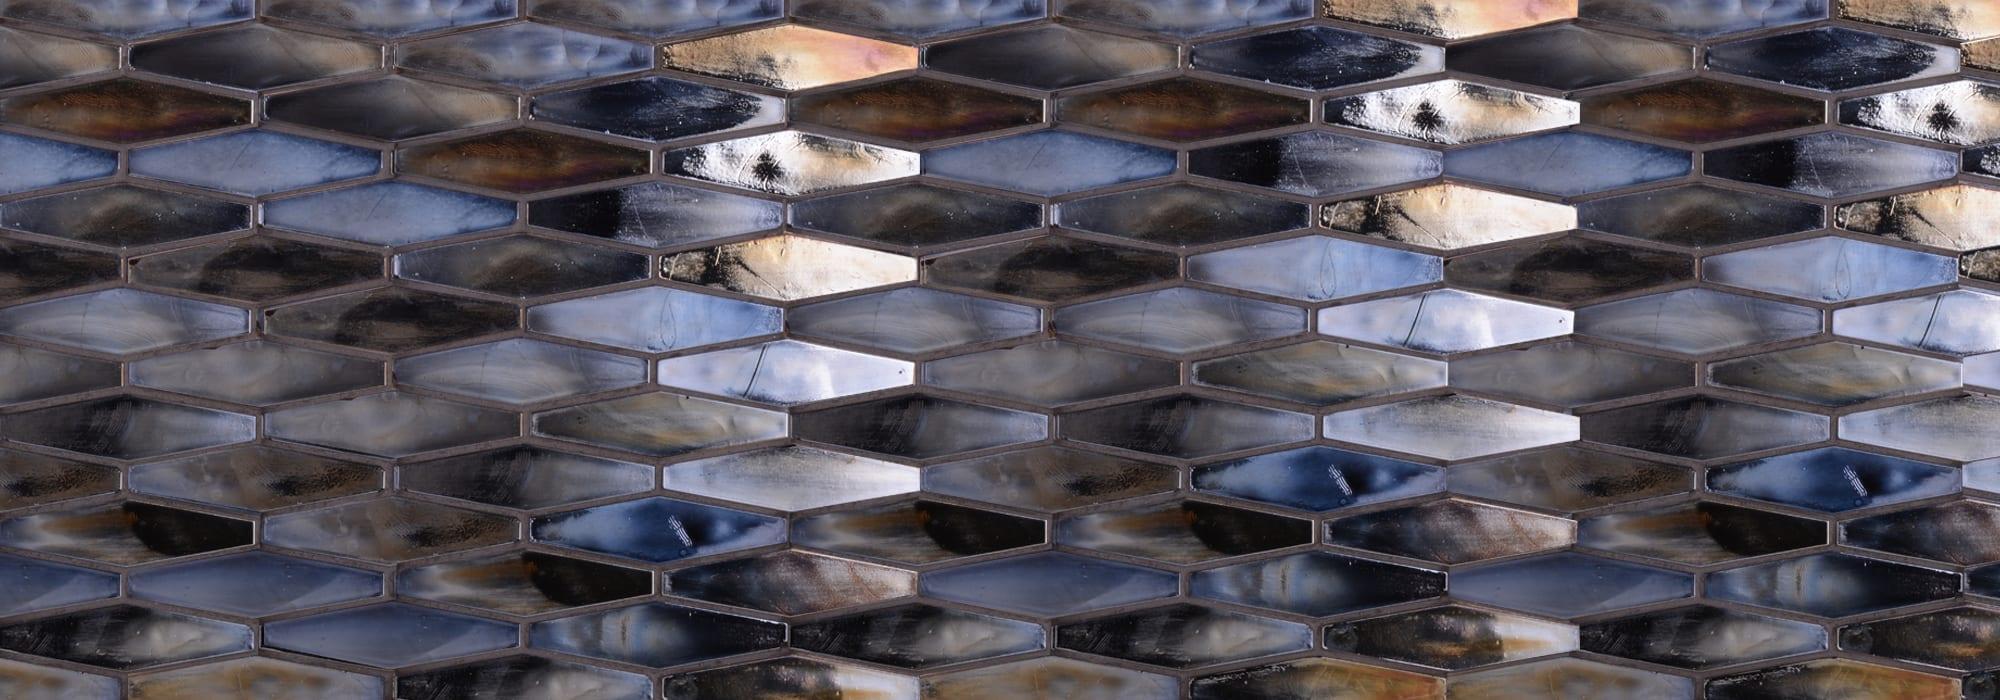 פסיפס זכוכית סיריוס by Milstone